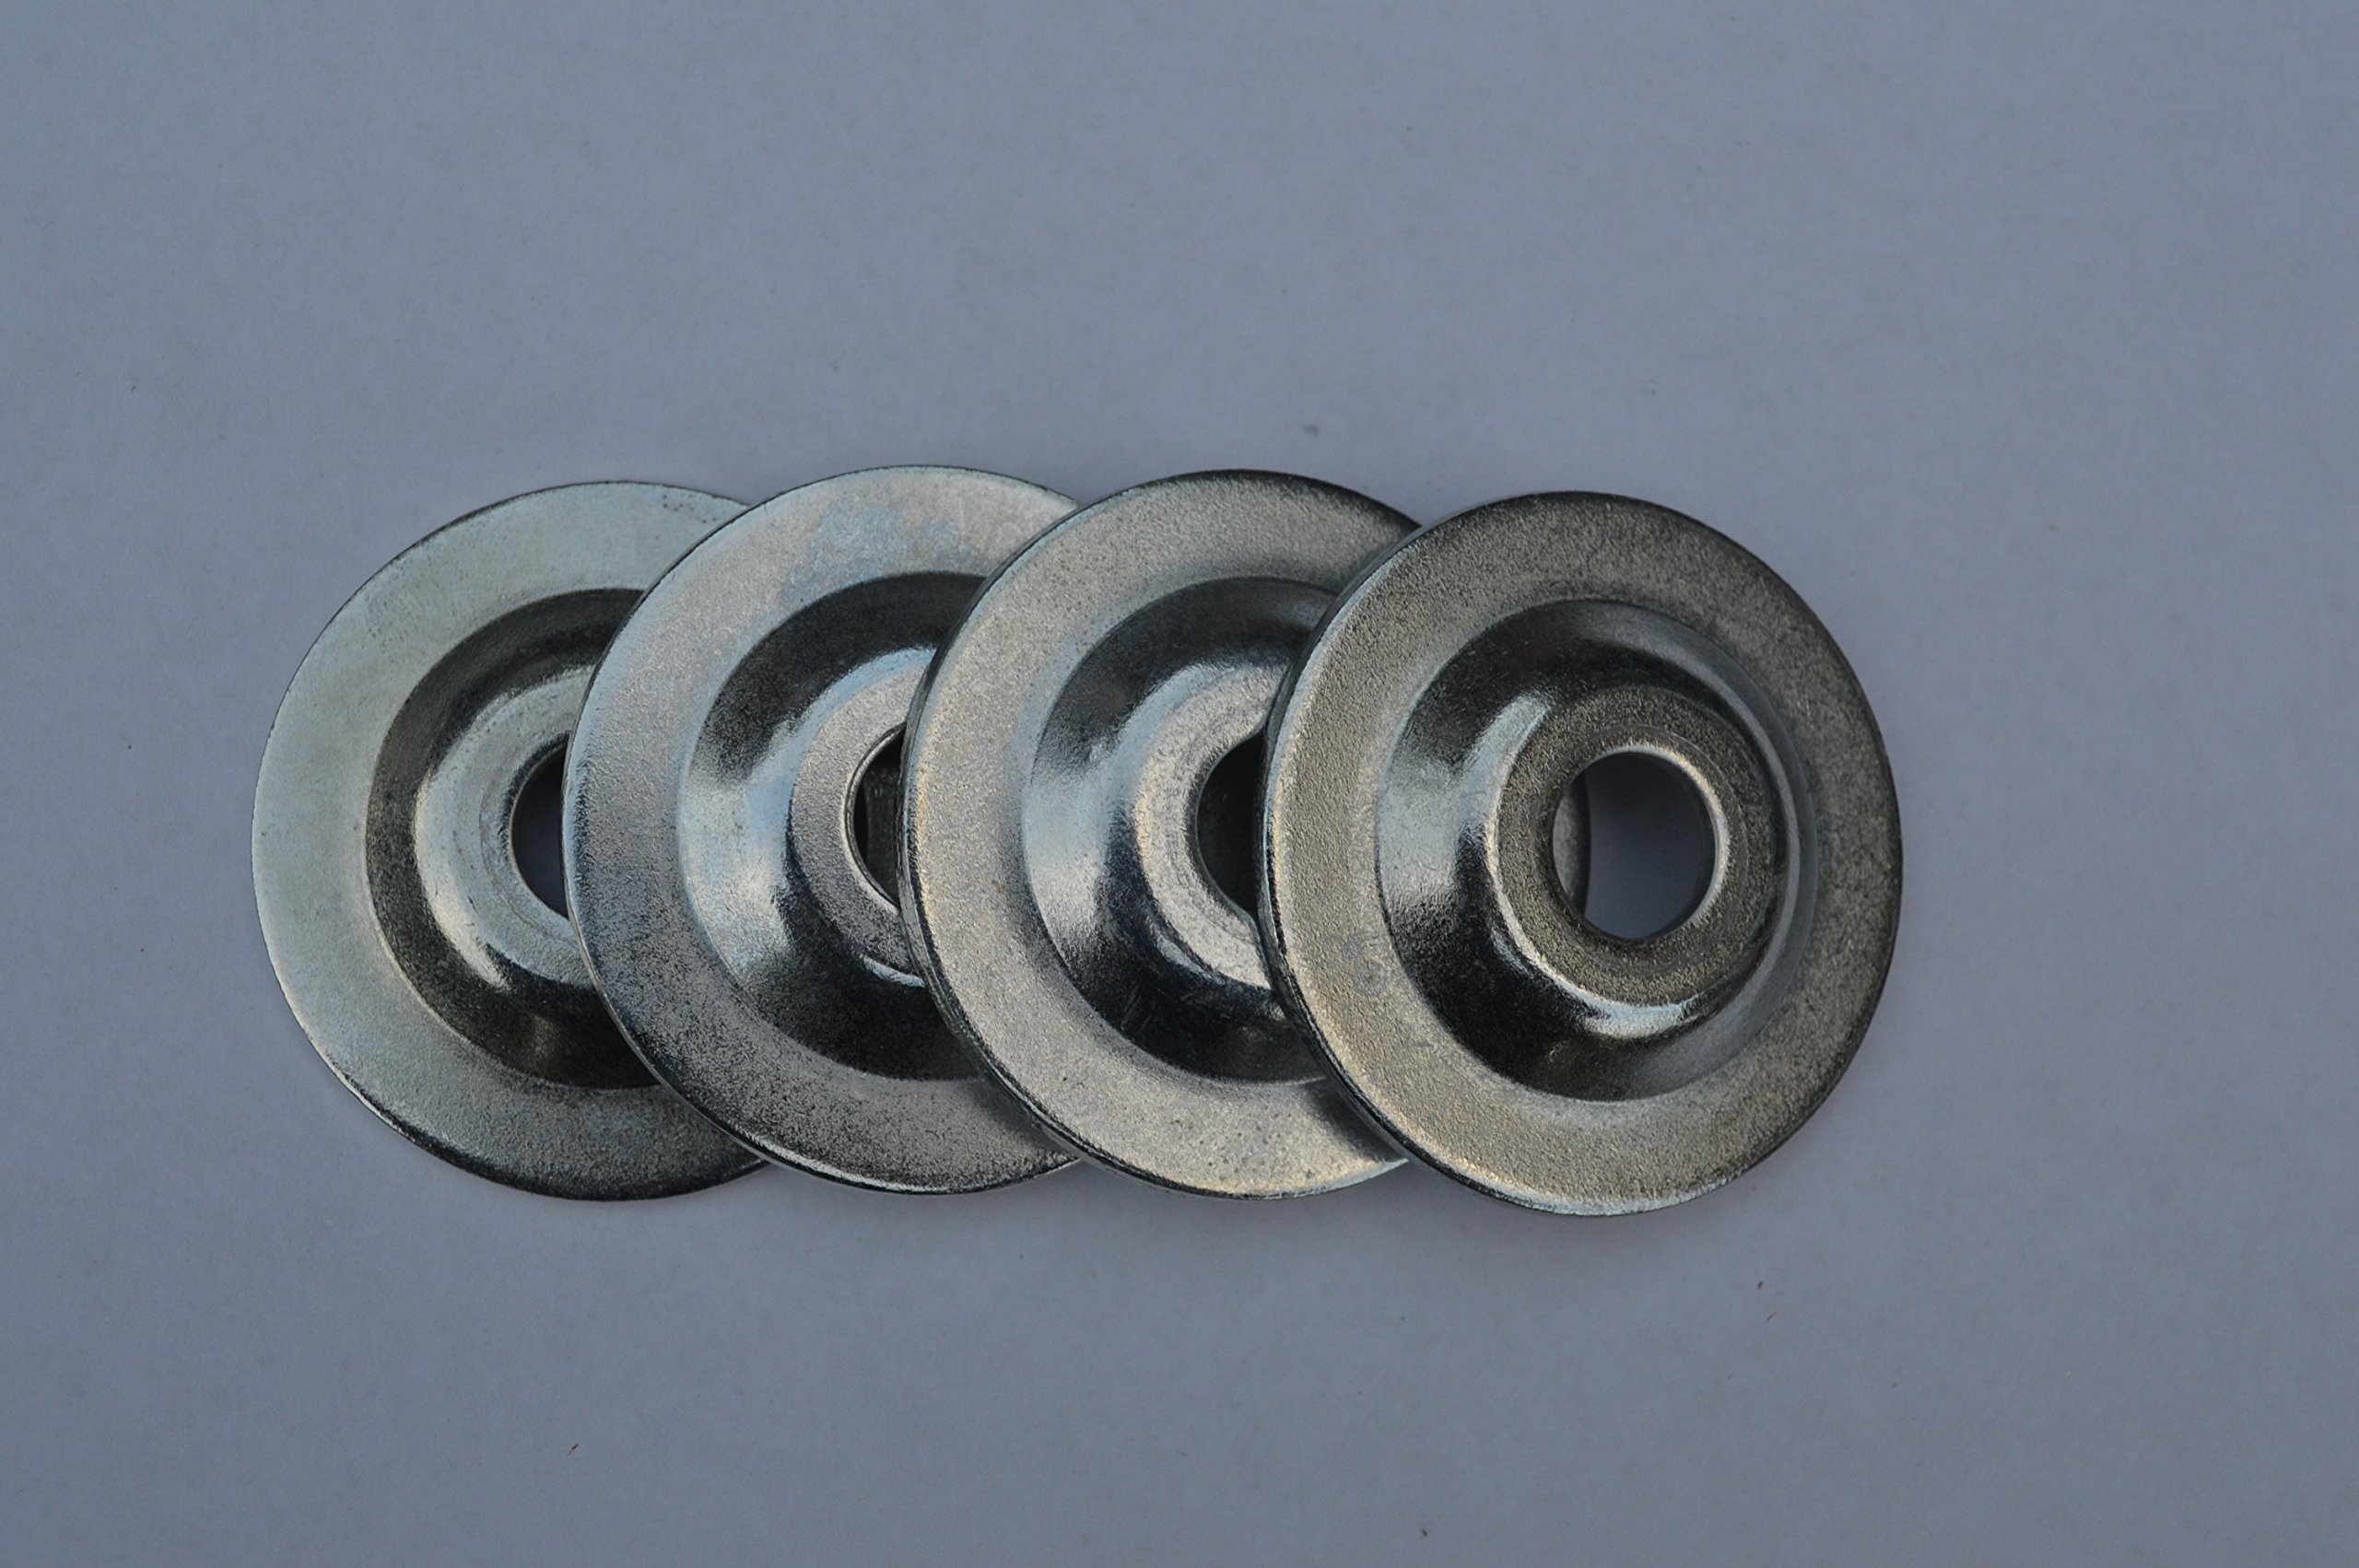 4, 2''bench Grinder Arbor Washer/flange/collar,1/2''arbor Grinding/wire Wheel by Gitachi (Image #2)